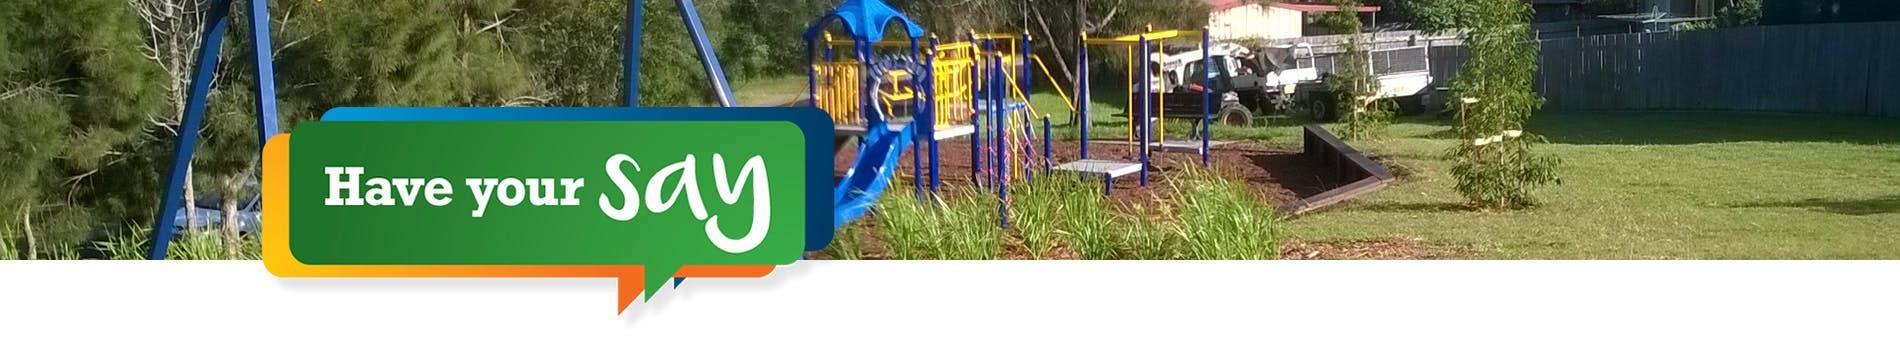 Endeavour Park Playground